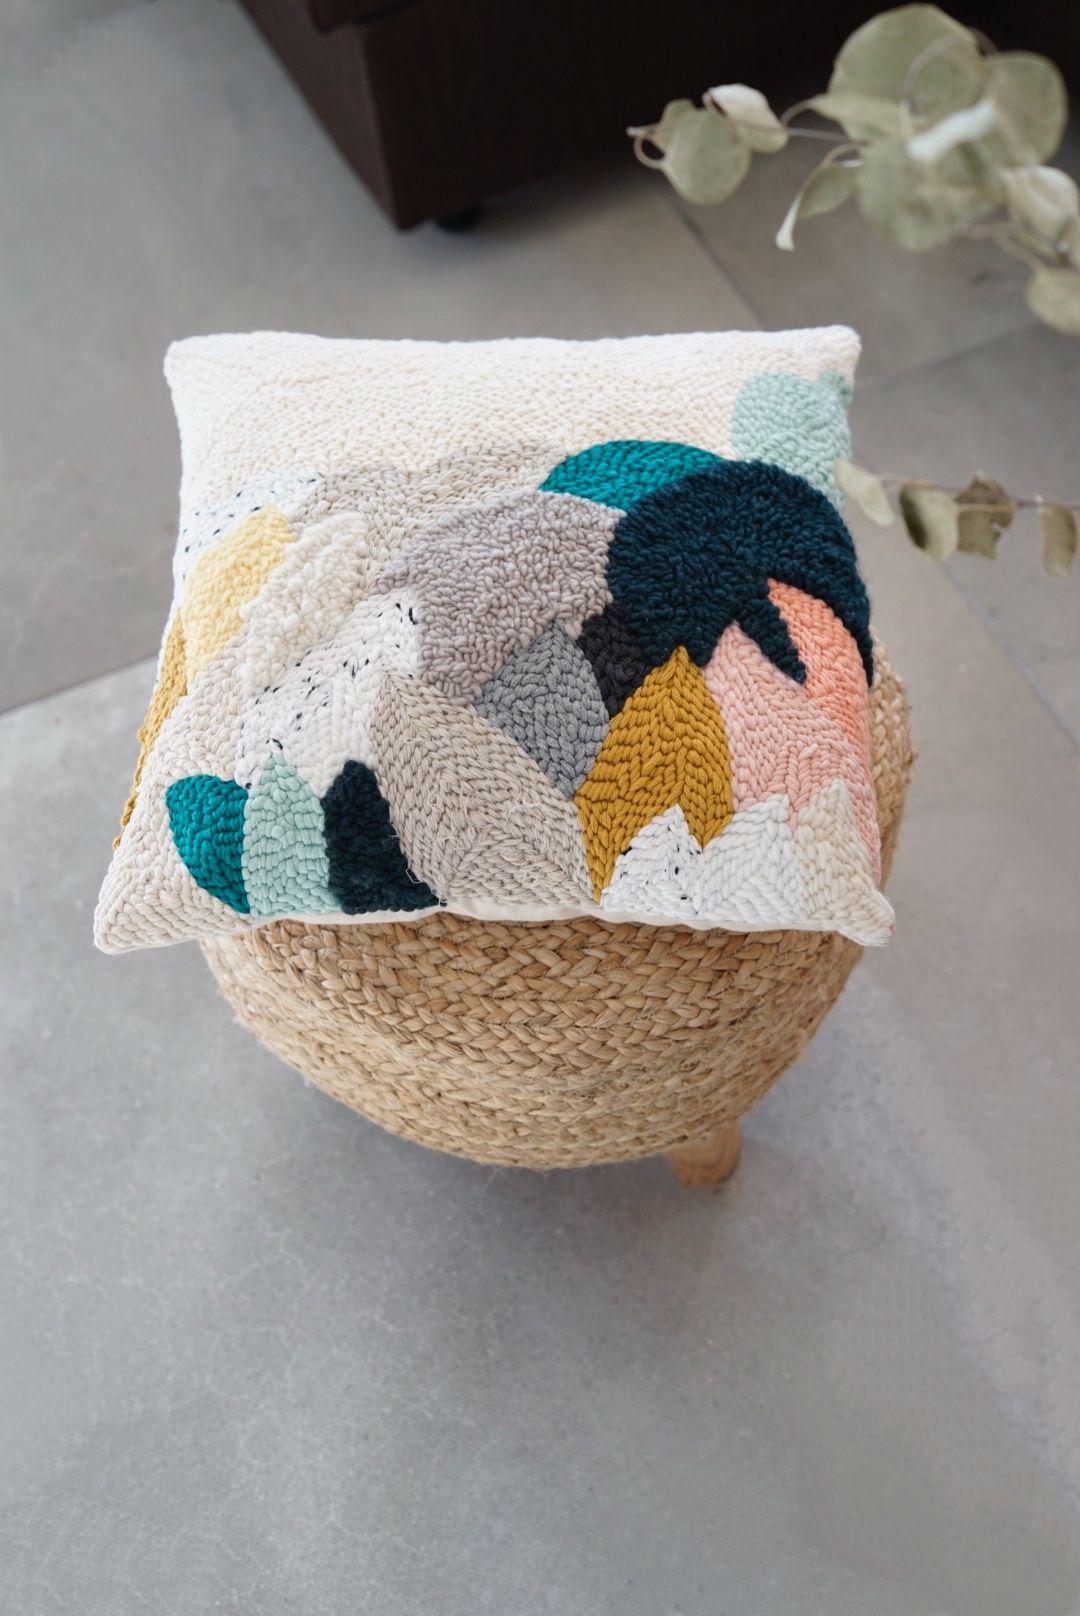 Punchneedle pillow / Rughooking by Julie Robert